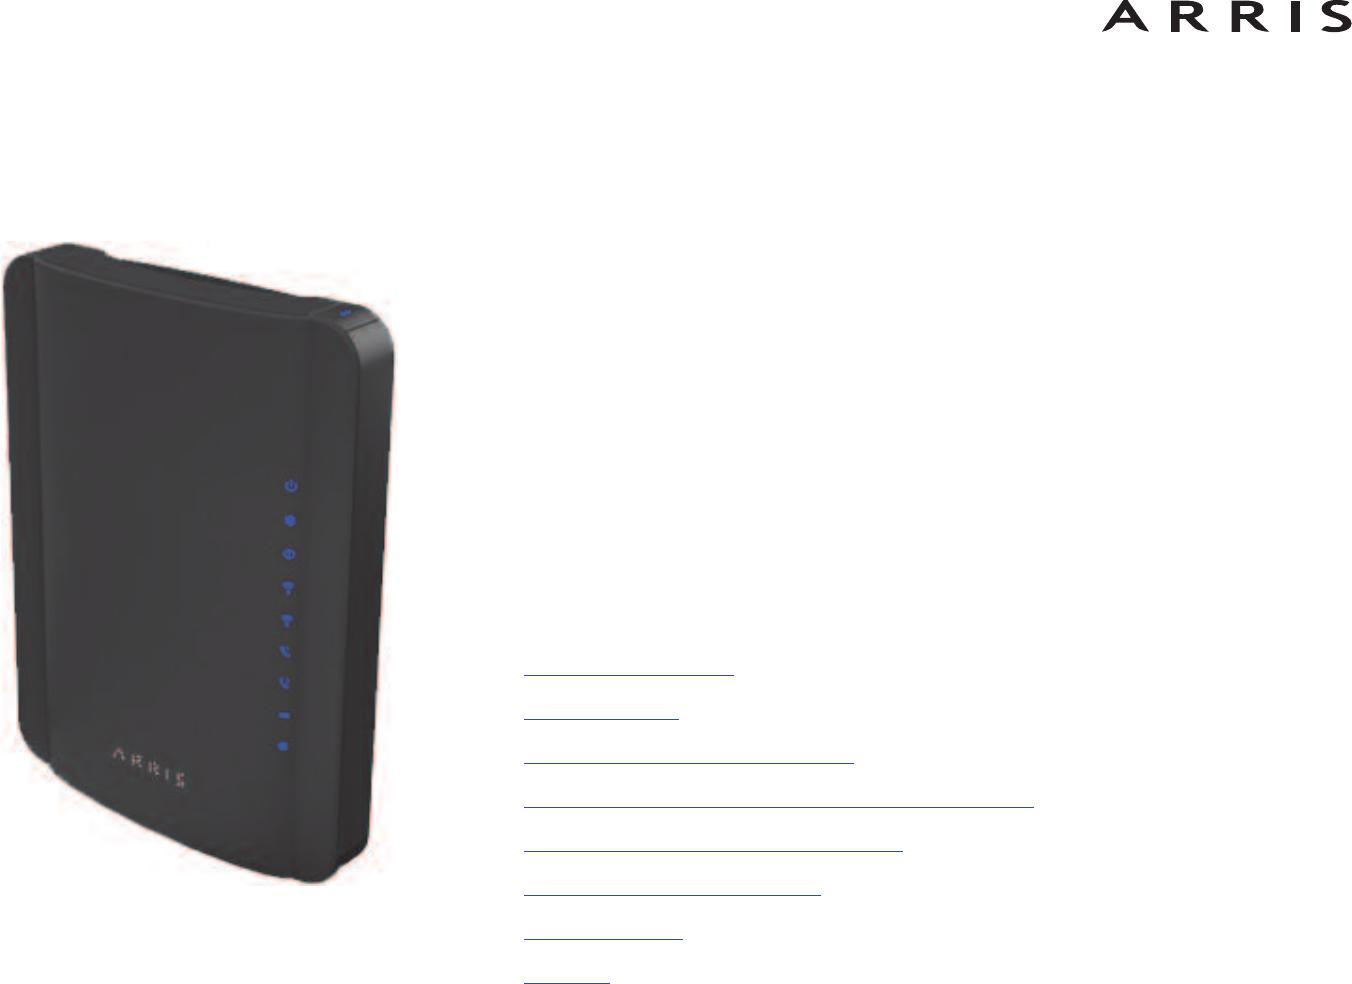 arris tg1672 touchstone telephony gateway user manual touchstone ... modem tg1672 wiring diagram  usermanual.wiki